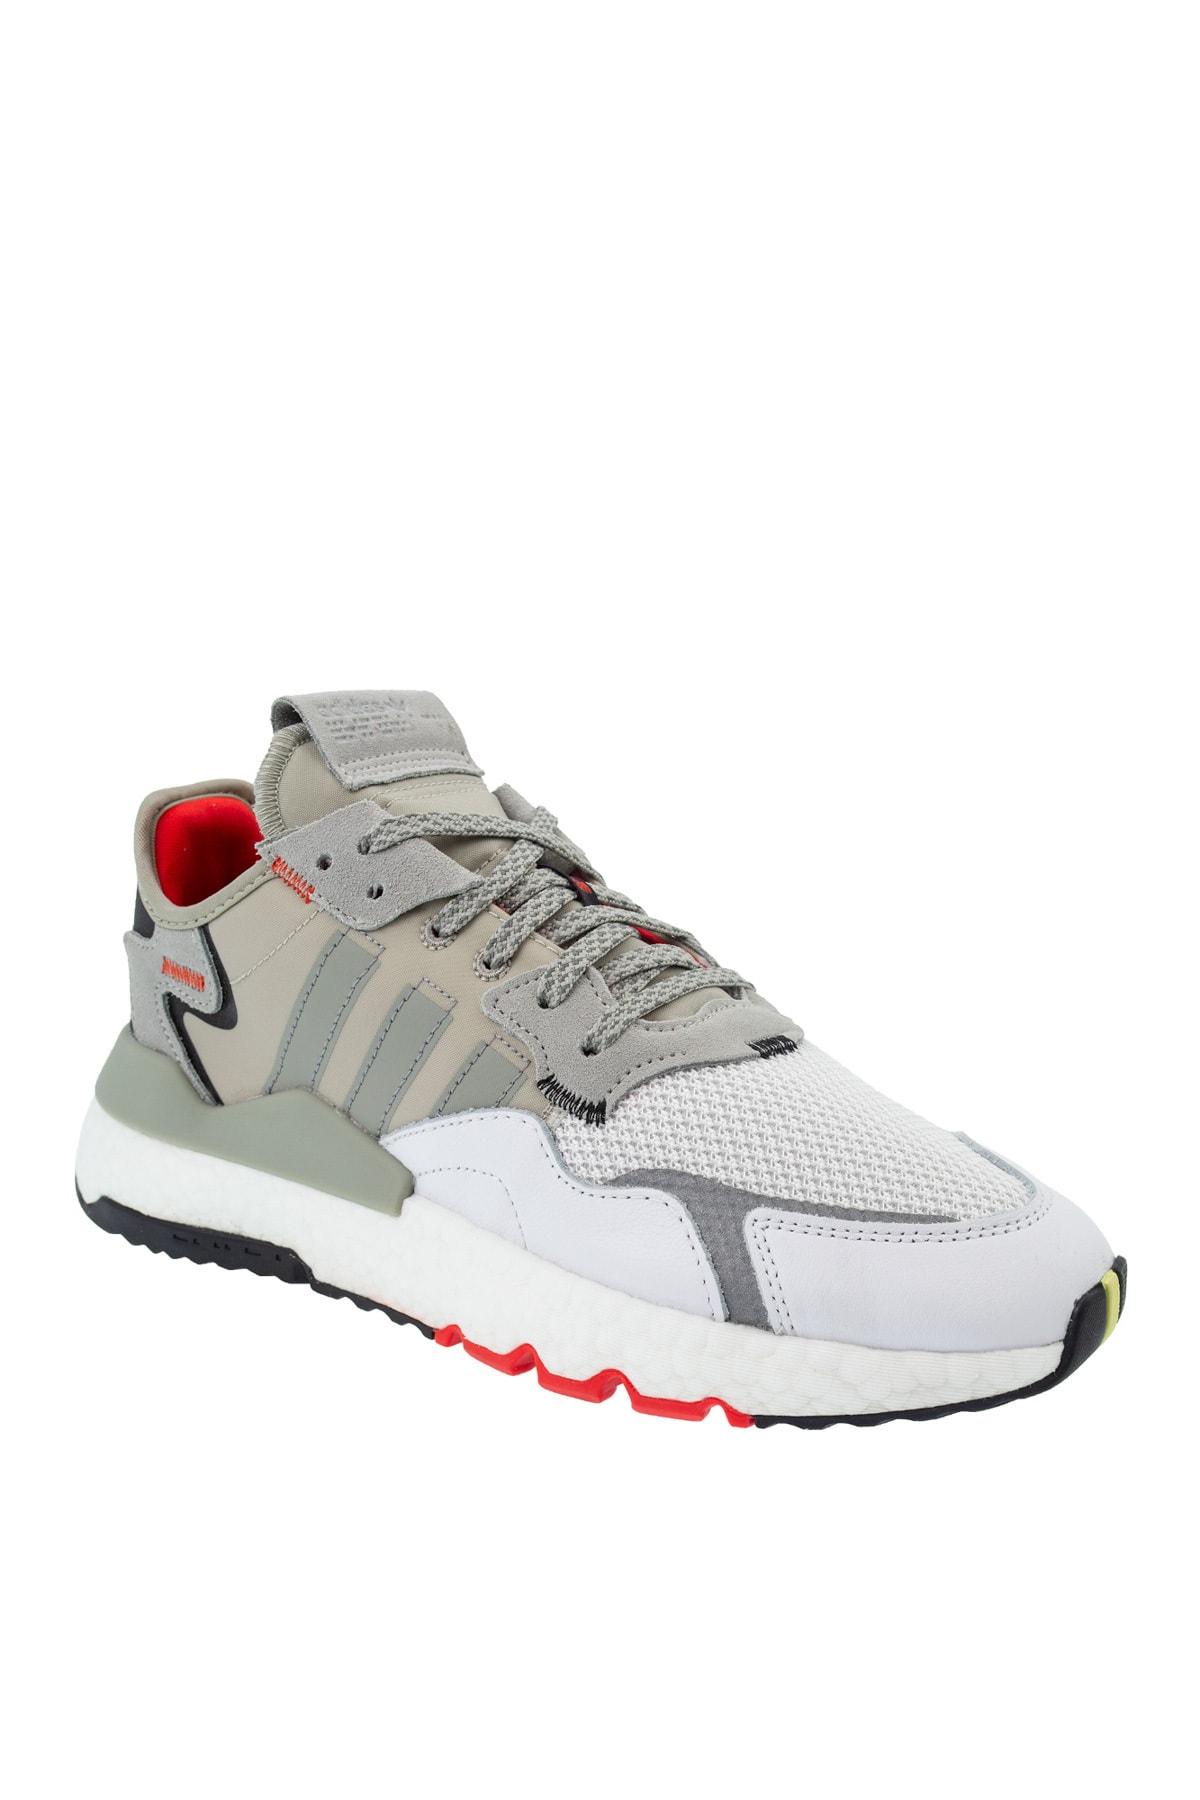 adidas Nite Jogger Erkek Gri Spor Ayakkabı (EF5409) 1